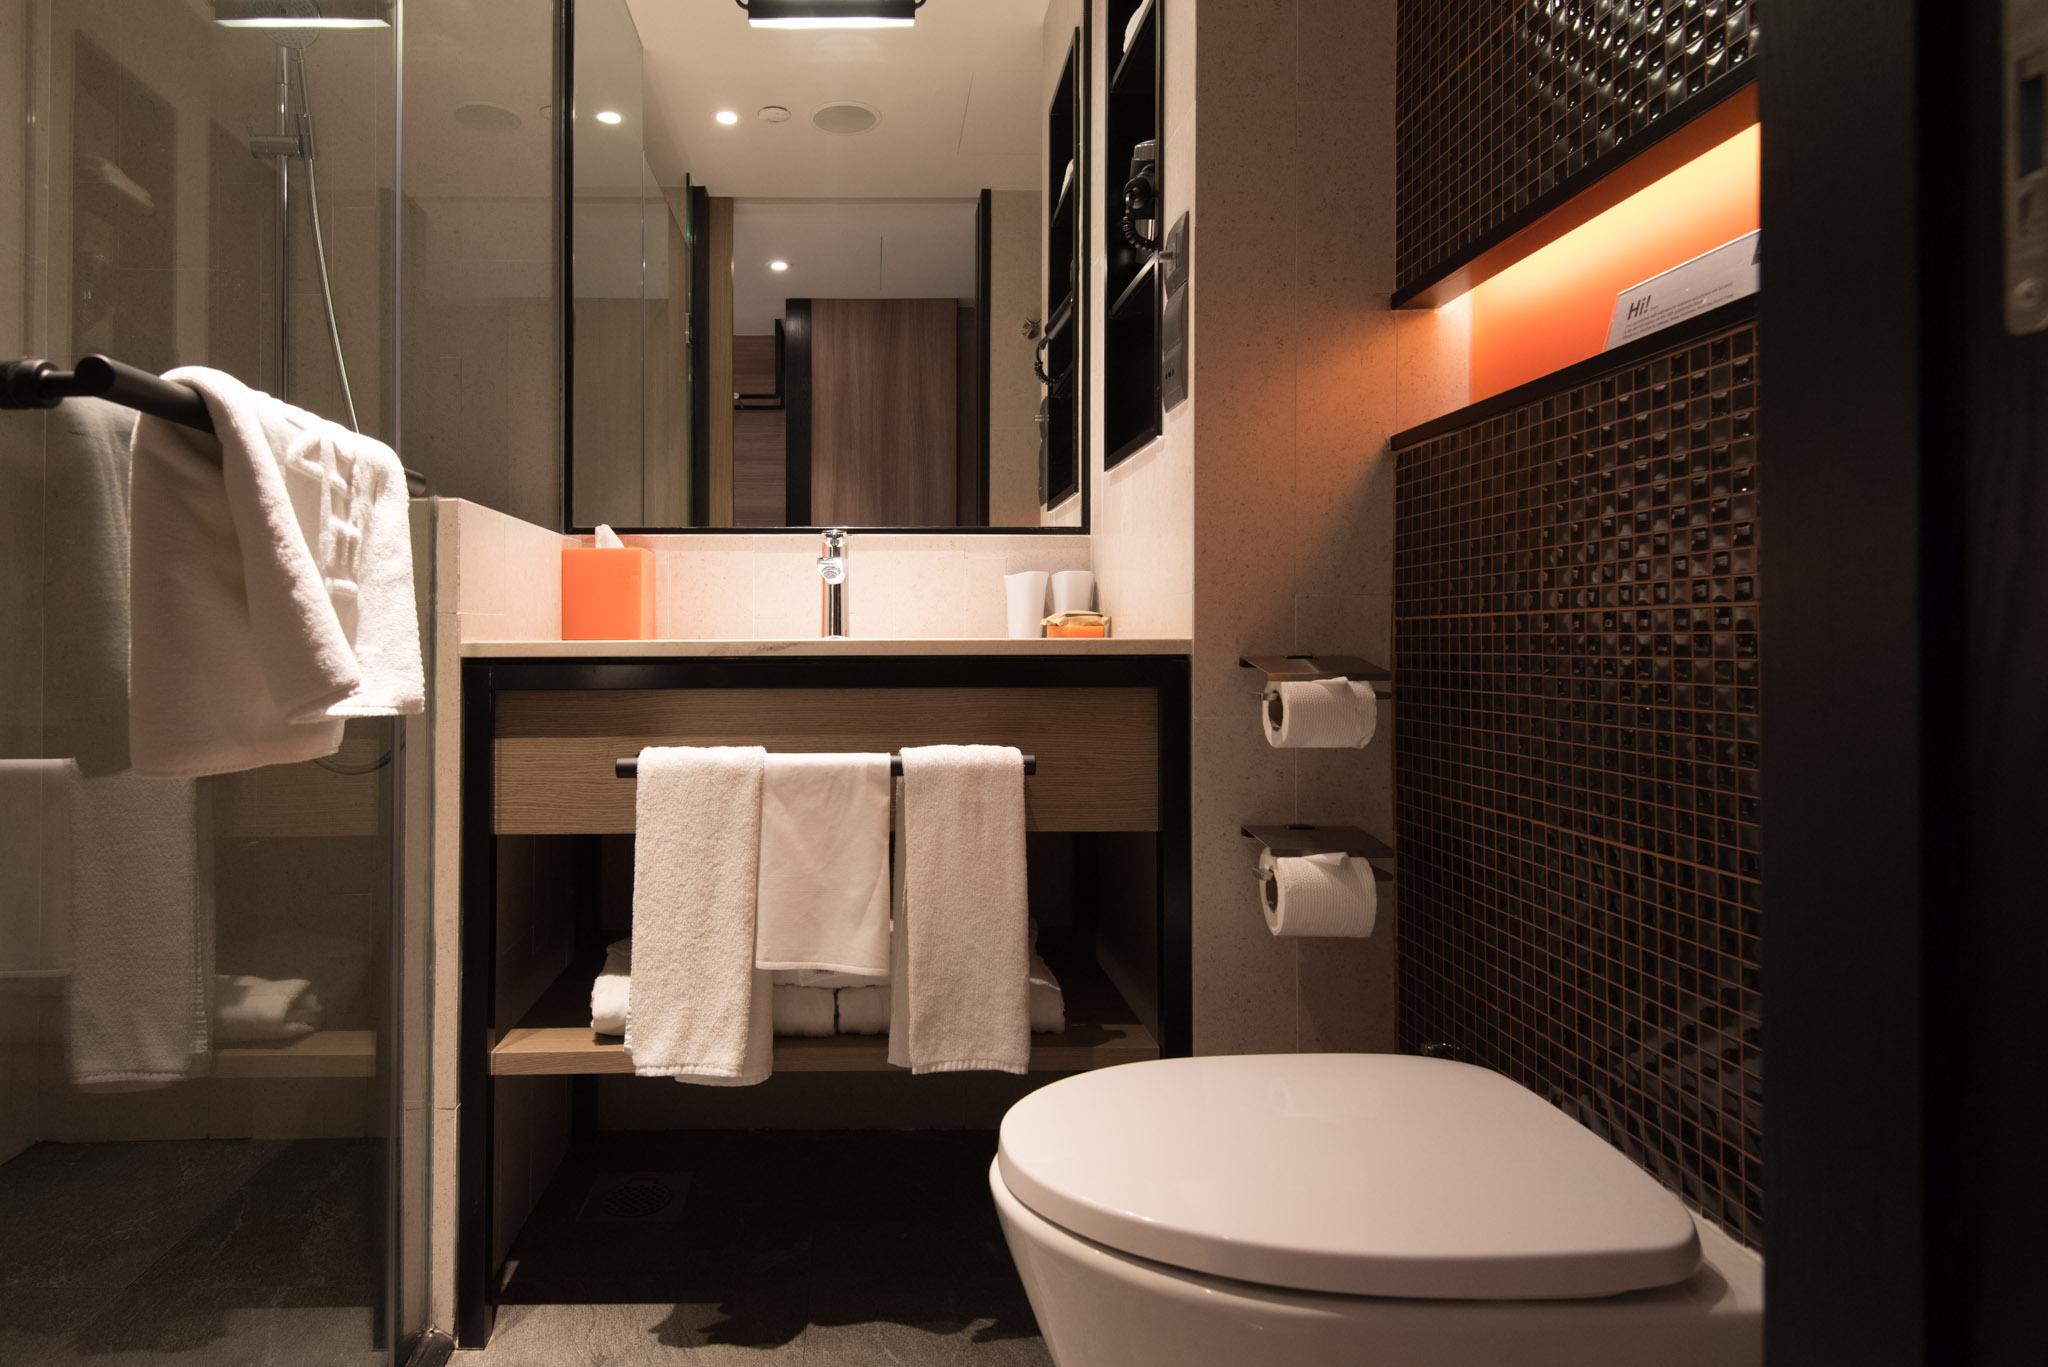 Bathroom of Club Room (Hotel Jen Tanglin)